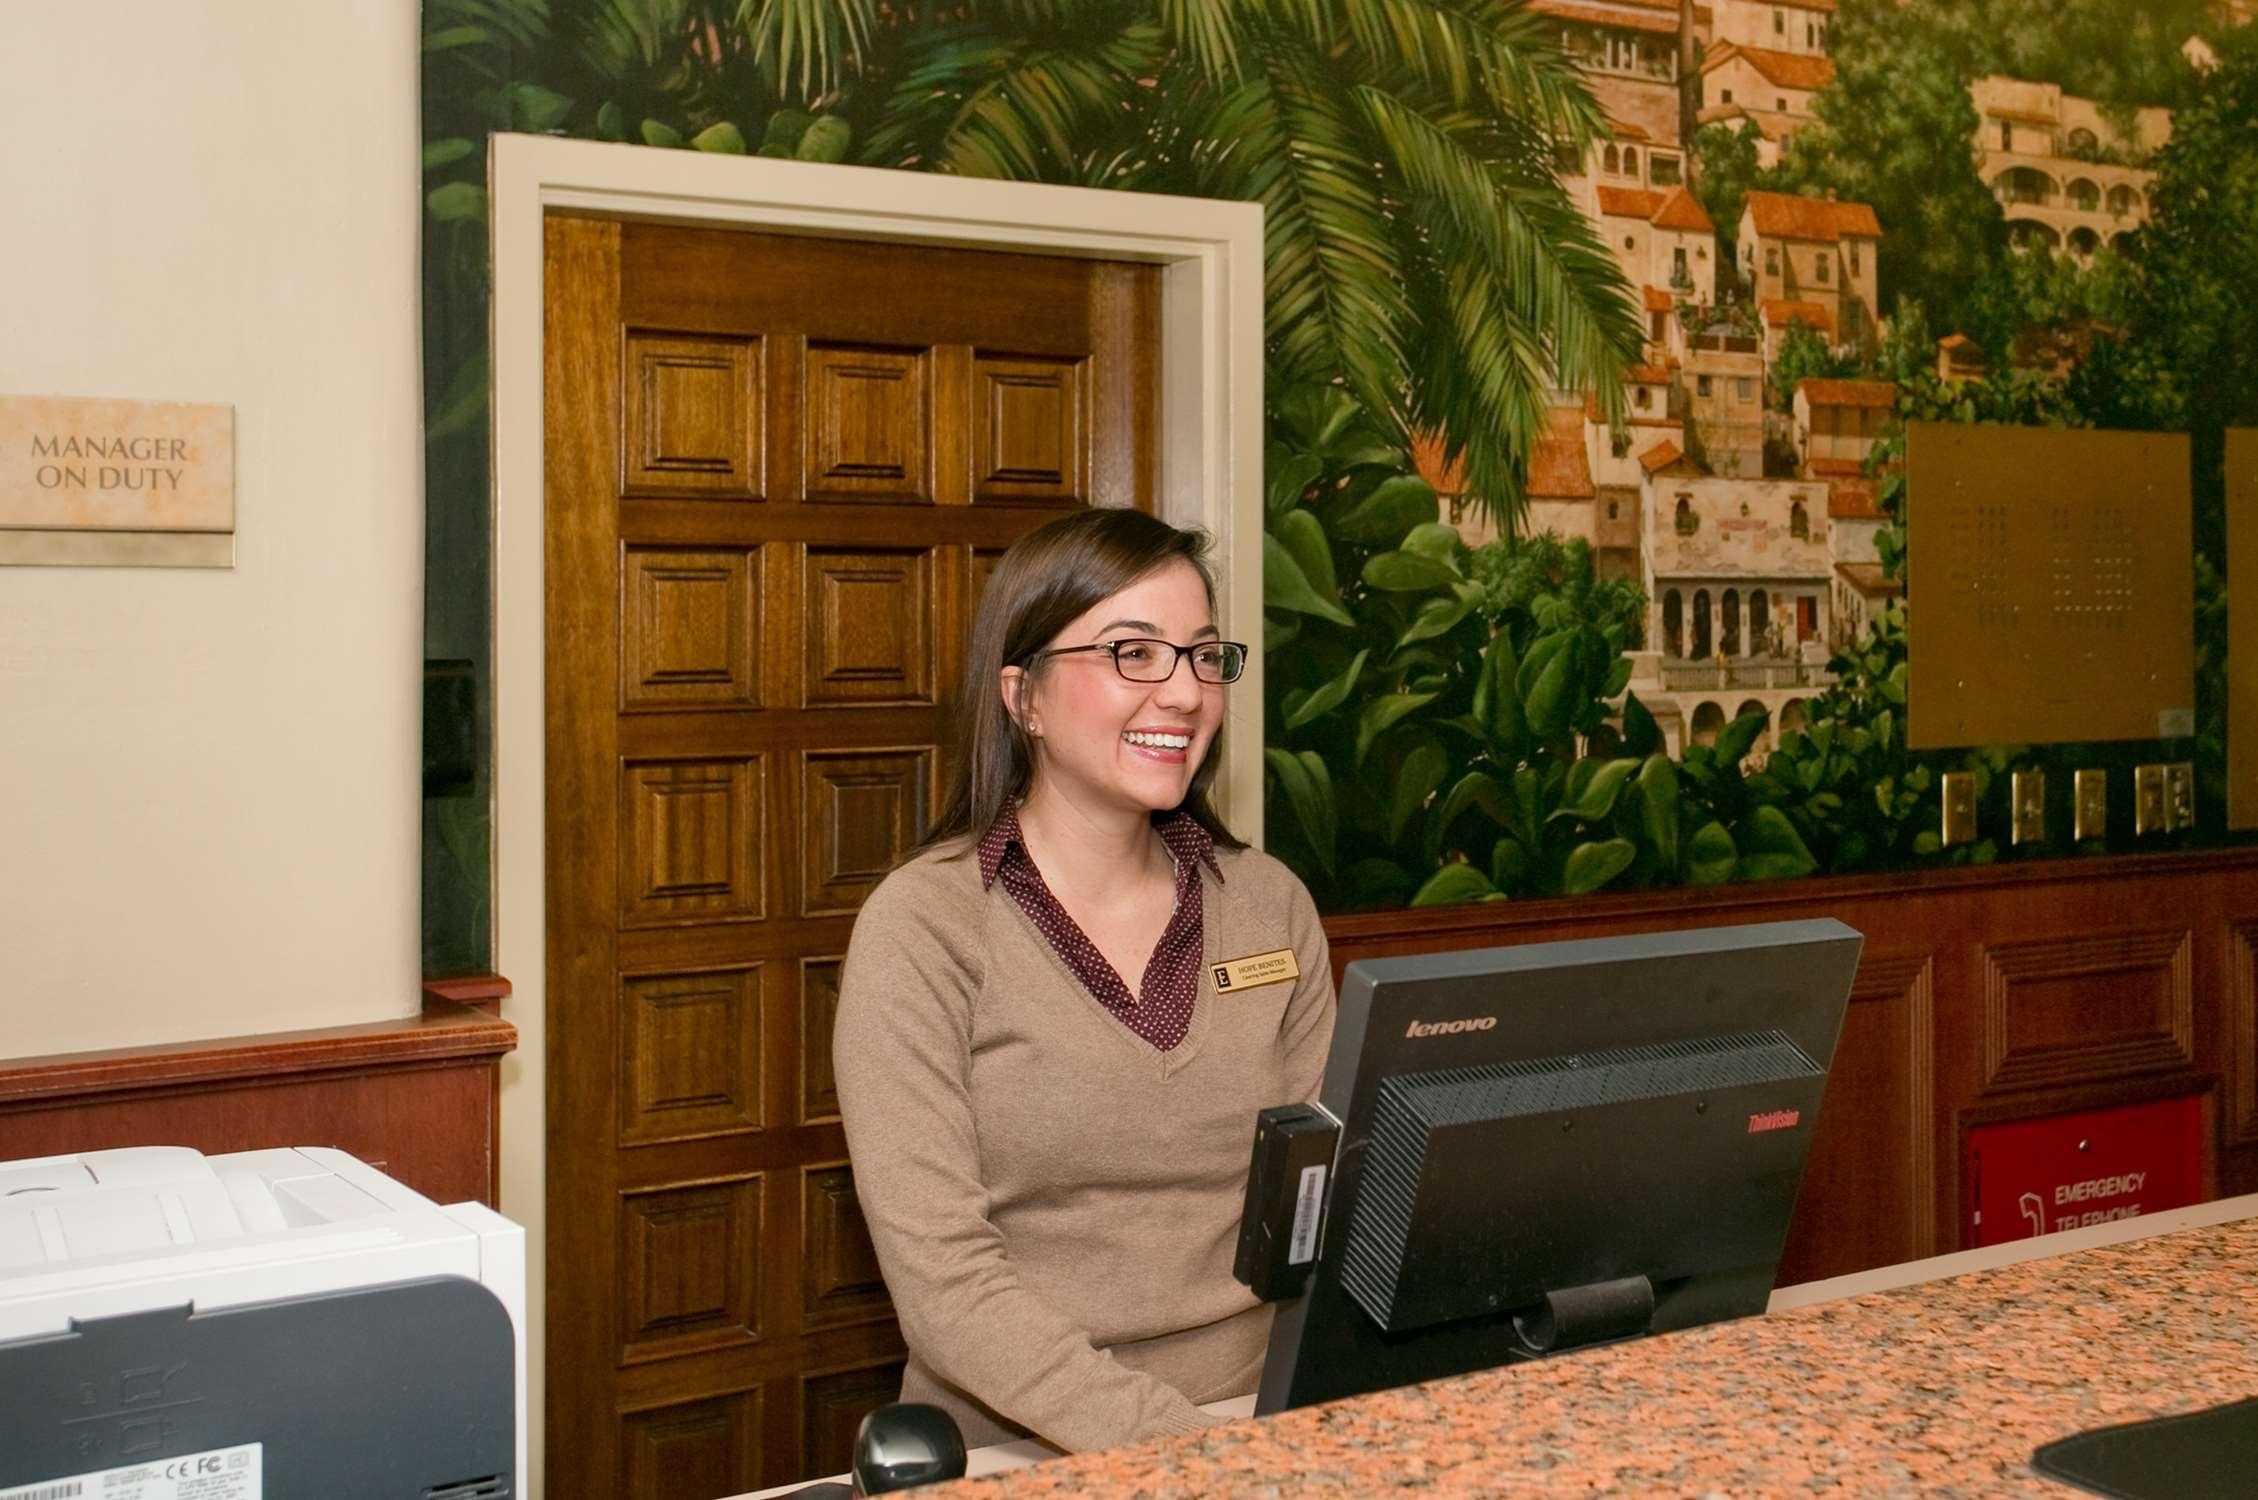 Embassy Suites by Hilton Arcadia Pasadena Area image 6